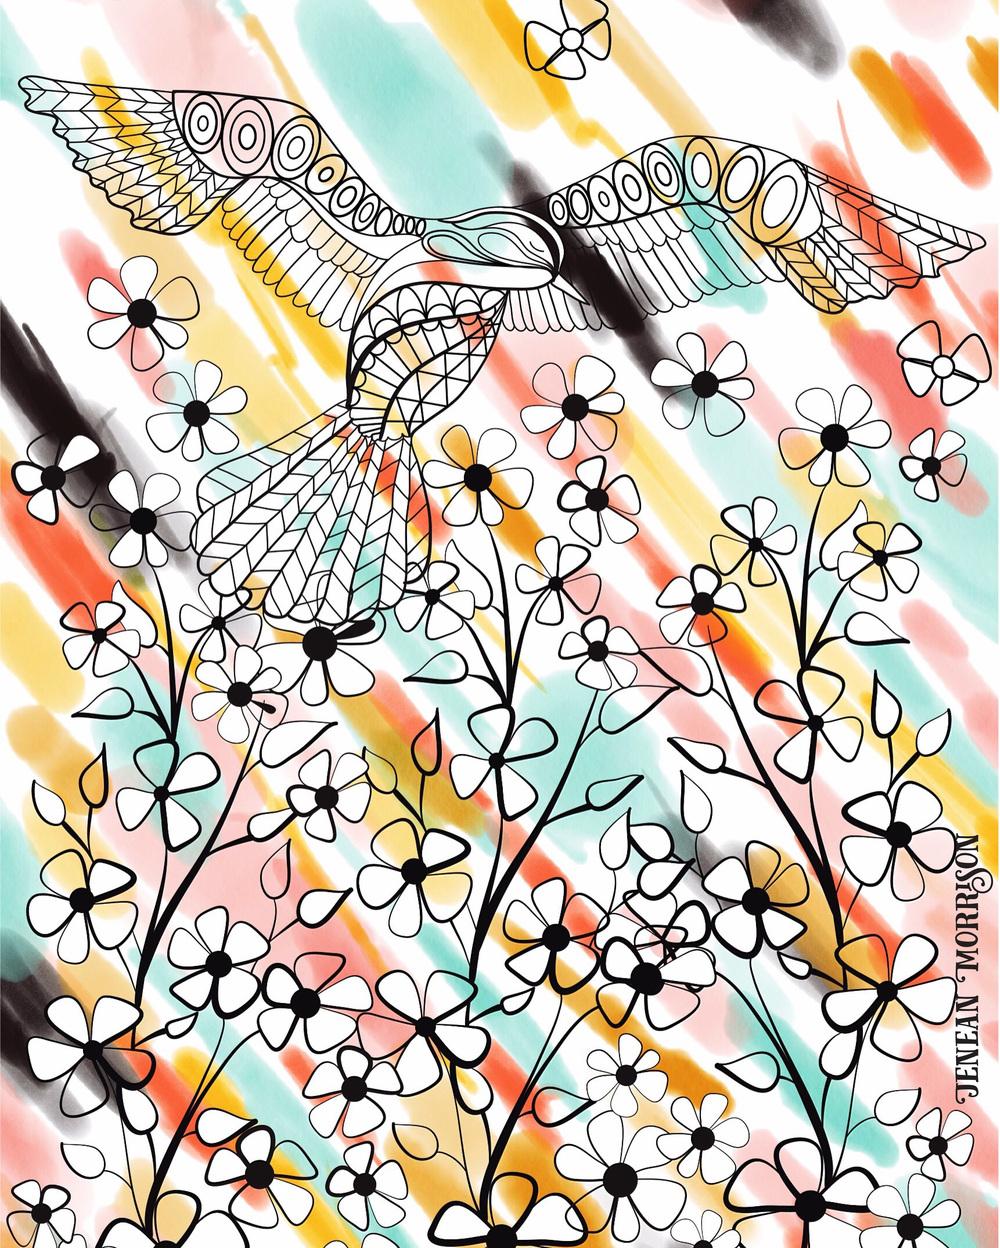 Jenean Morrison iPad Artwork 2016